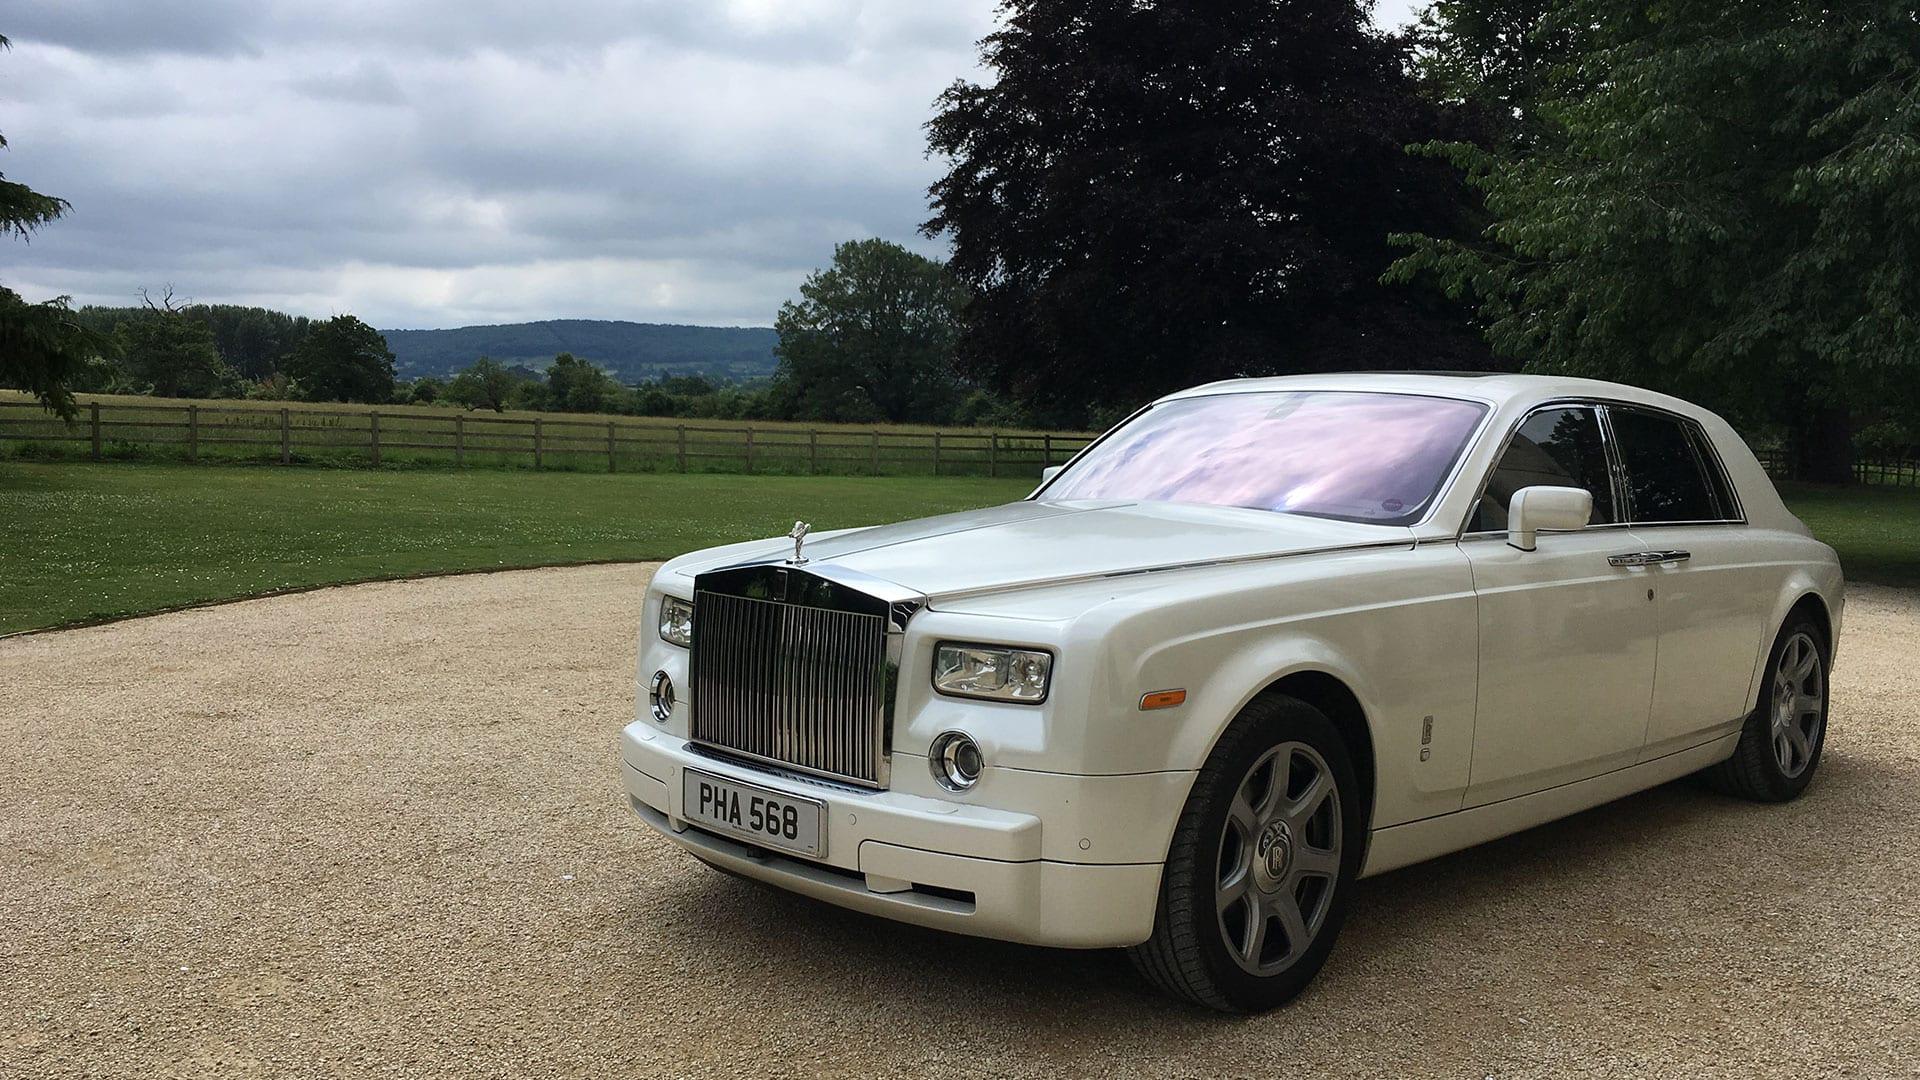 The Rolls Royce Phantom At The Reception Venue Azure Wedding Cars